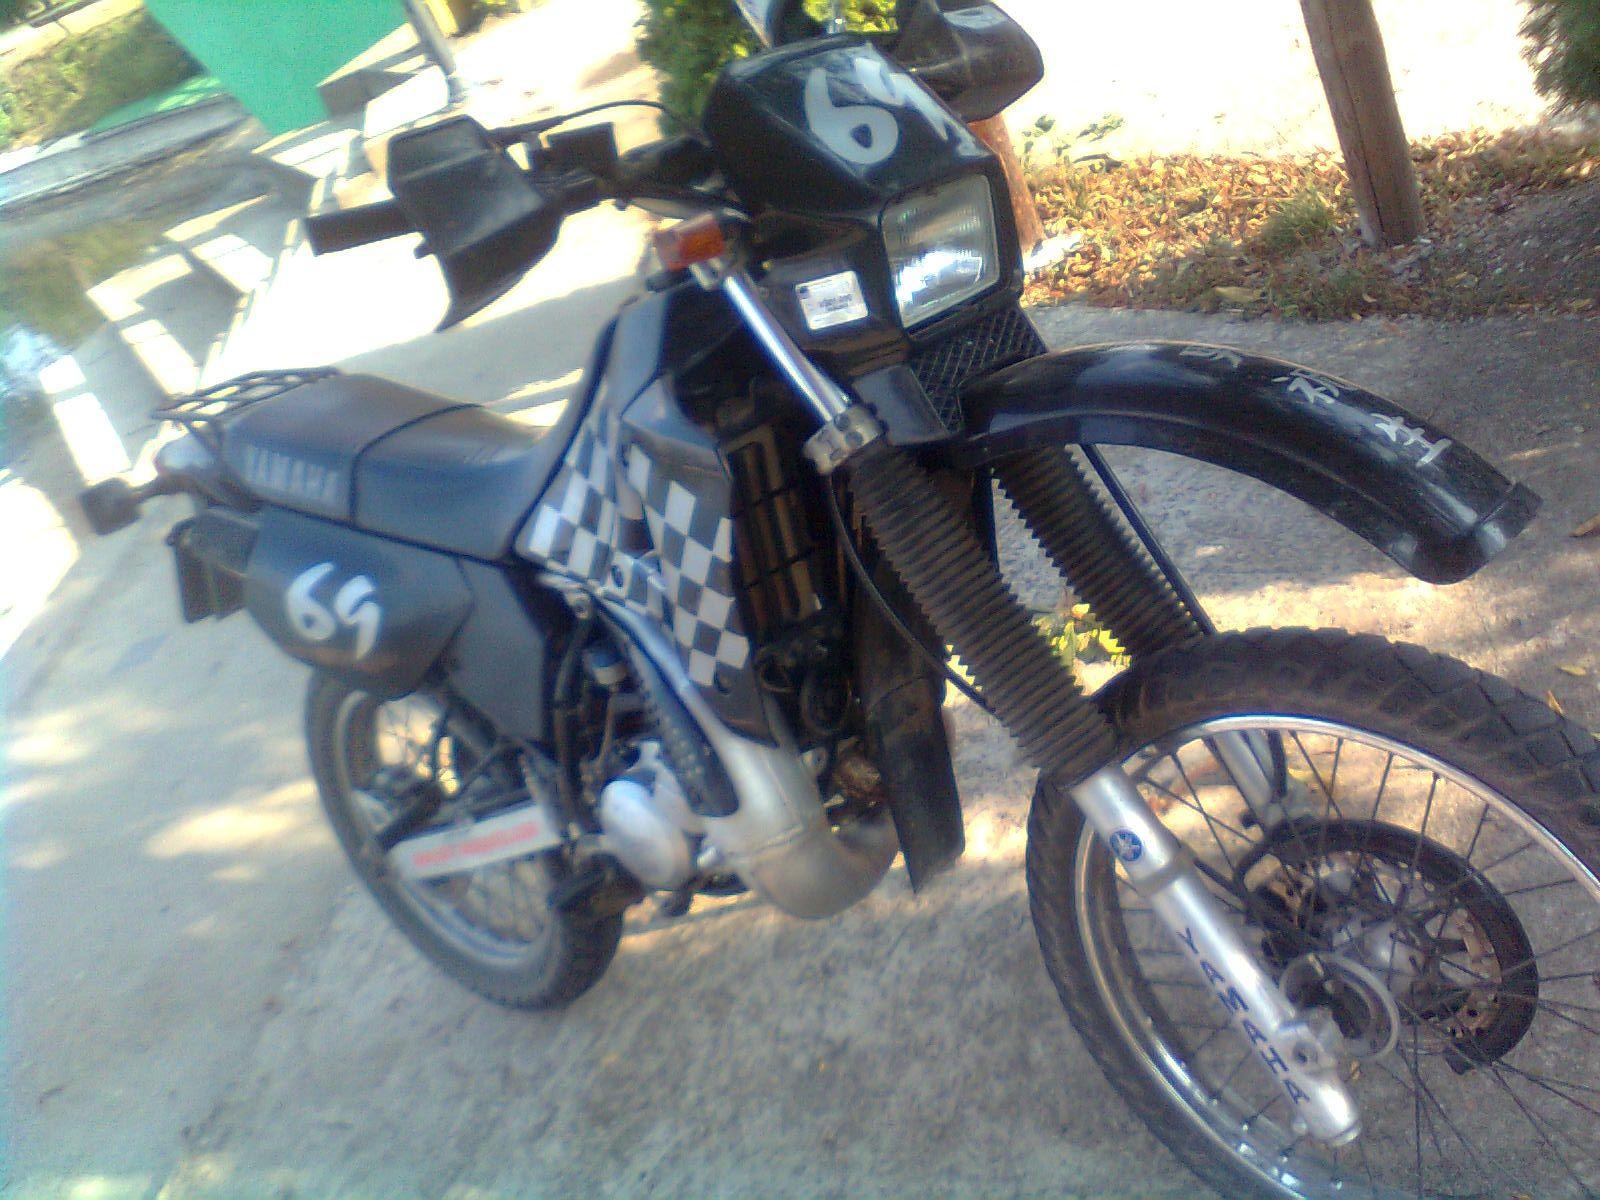 Kupujem Prodajem Motori 125 Kubika Enduro Cross Motori Prodaja